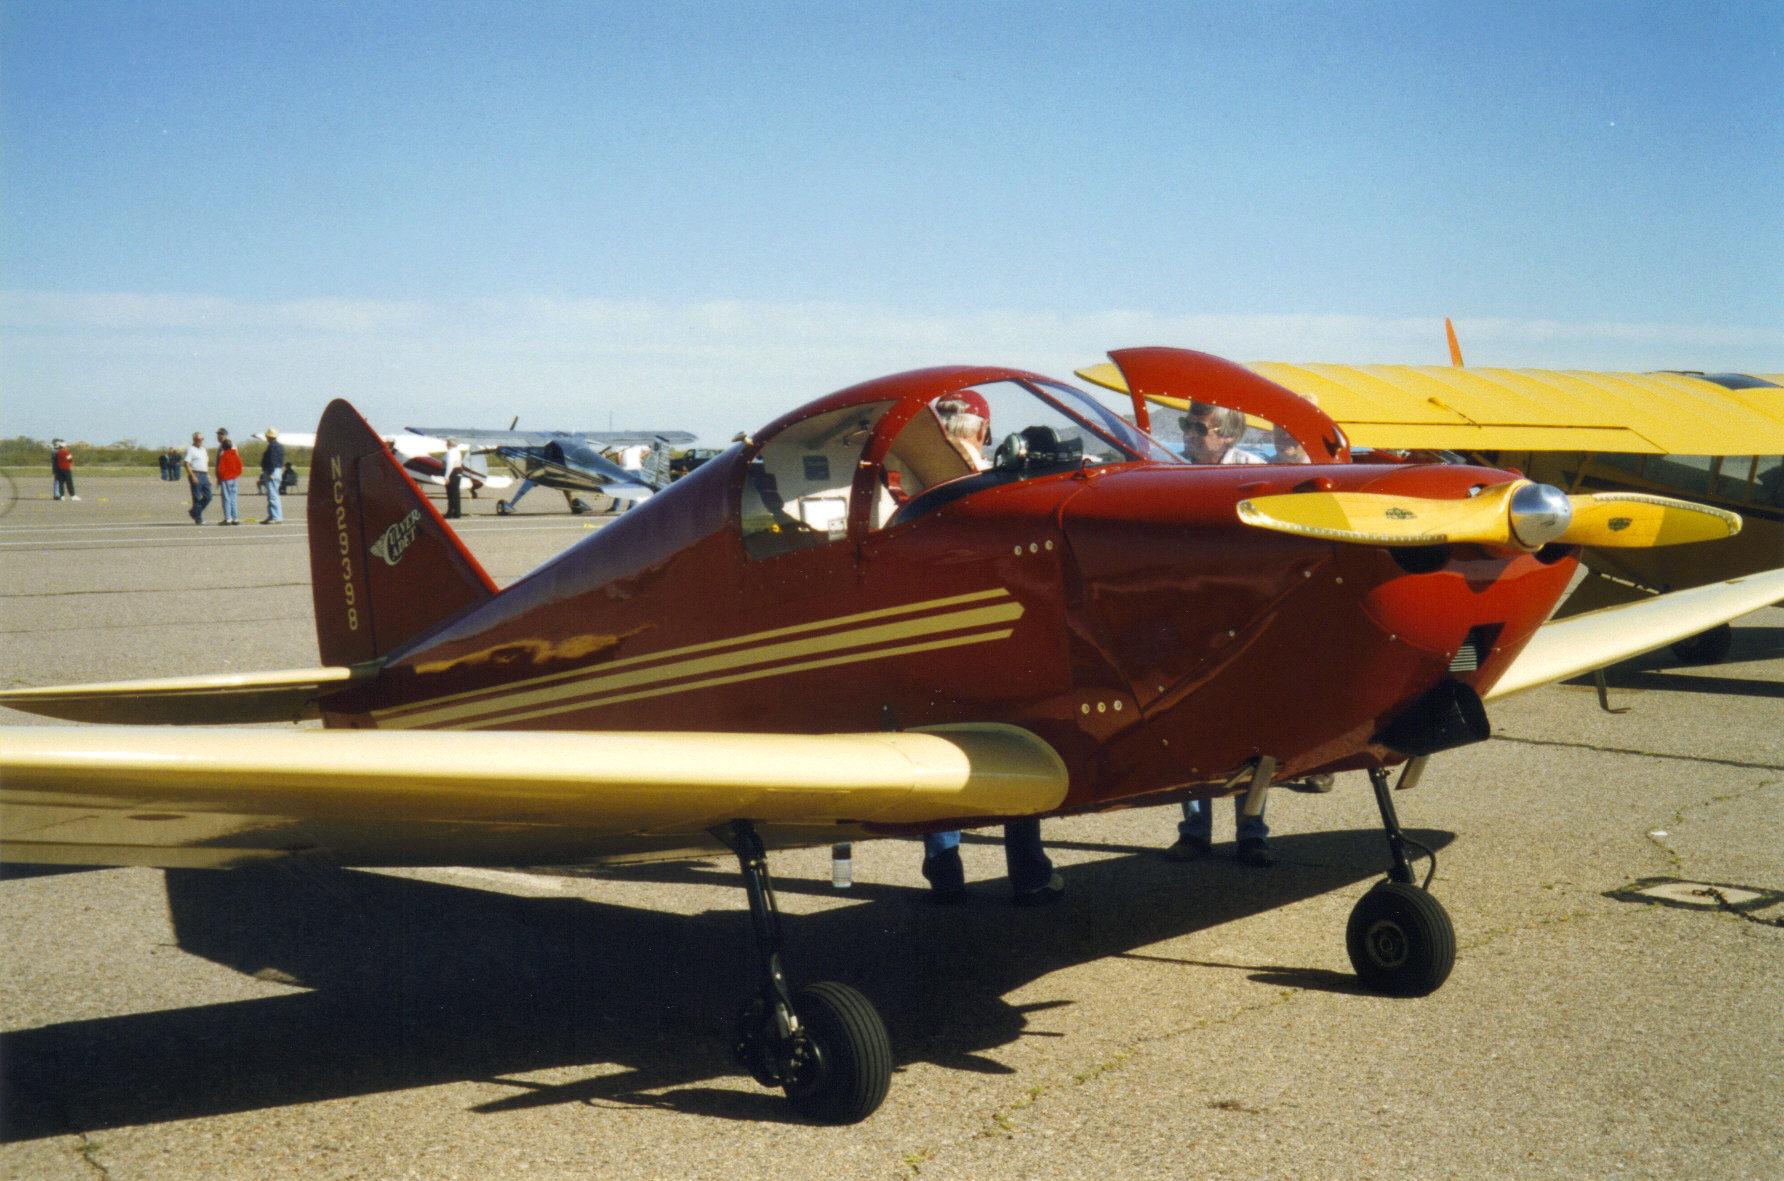 piper aircraft wallpaper the - photo #32